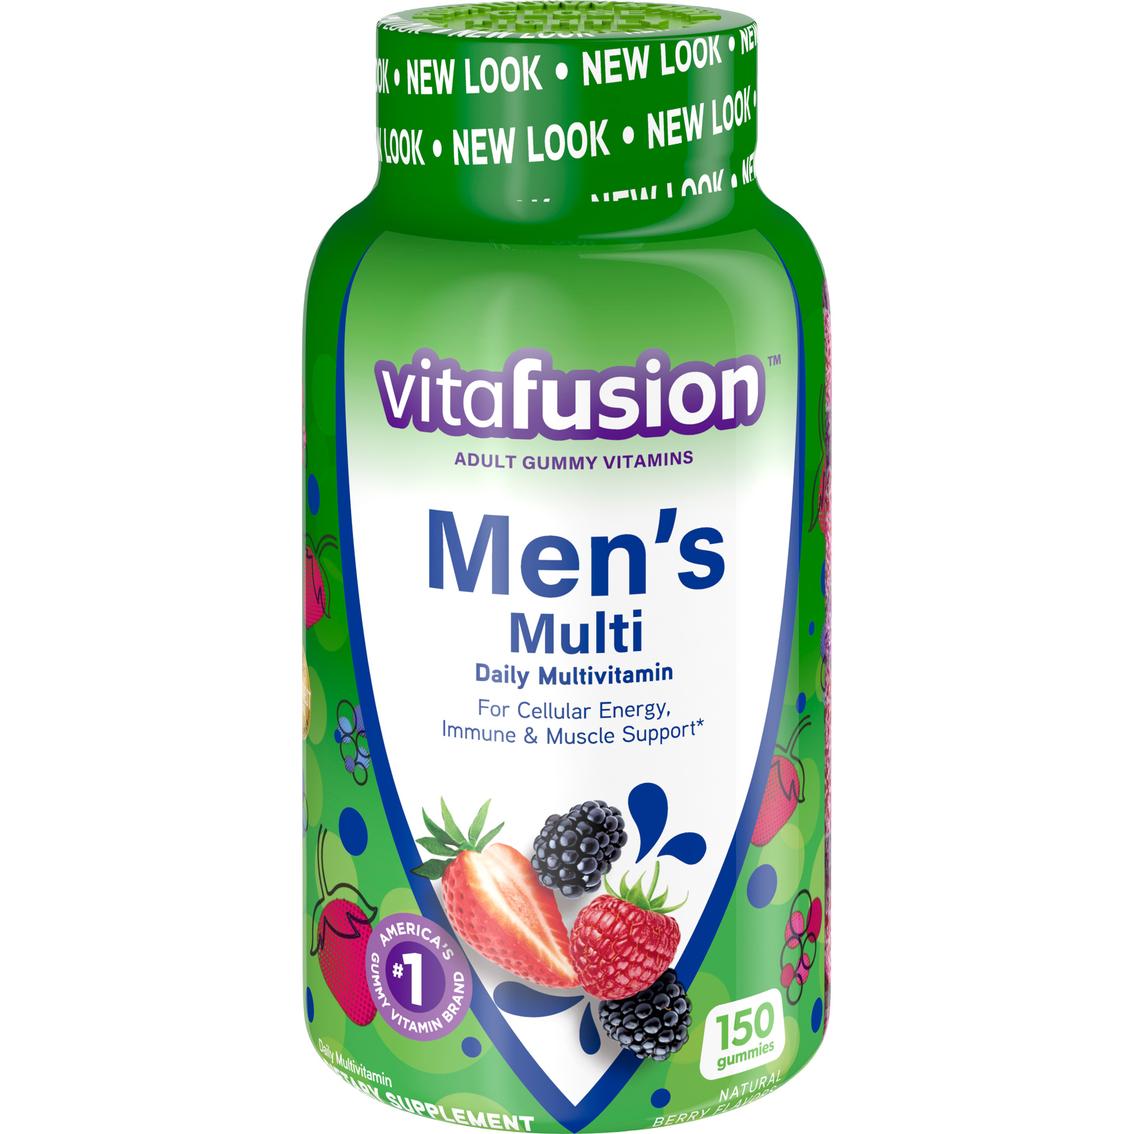 Vitafusion Men's Gummy Multivitamins 150 Pk  | Vitamins | Beauty